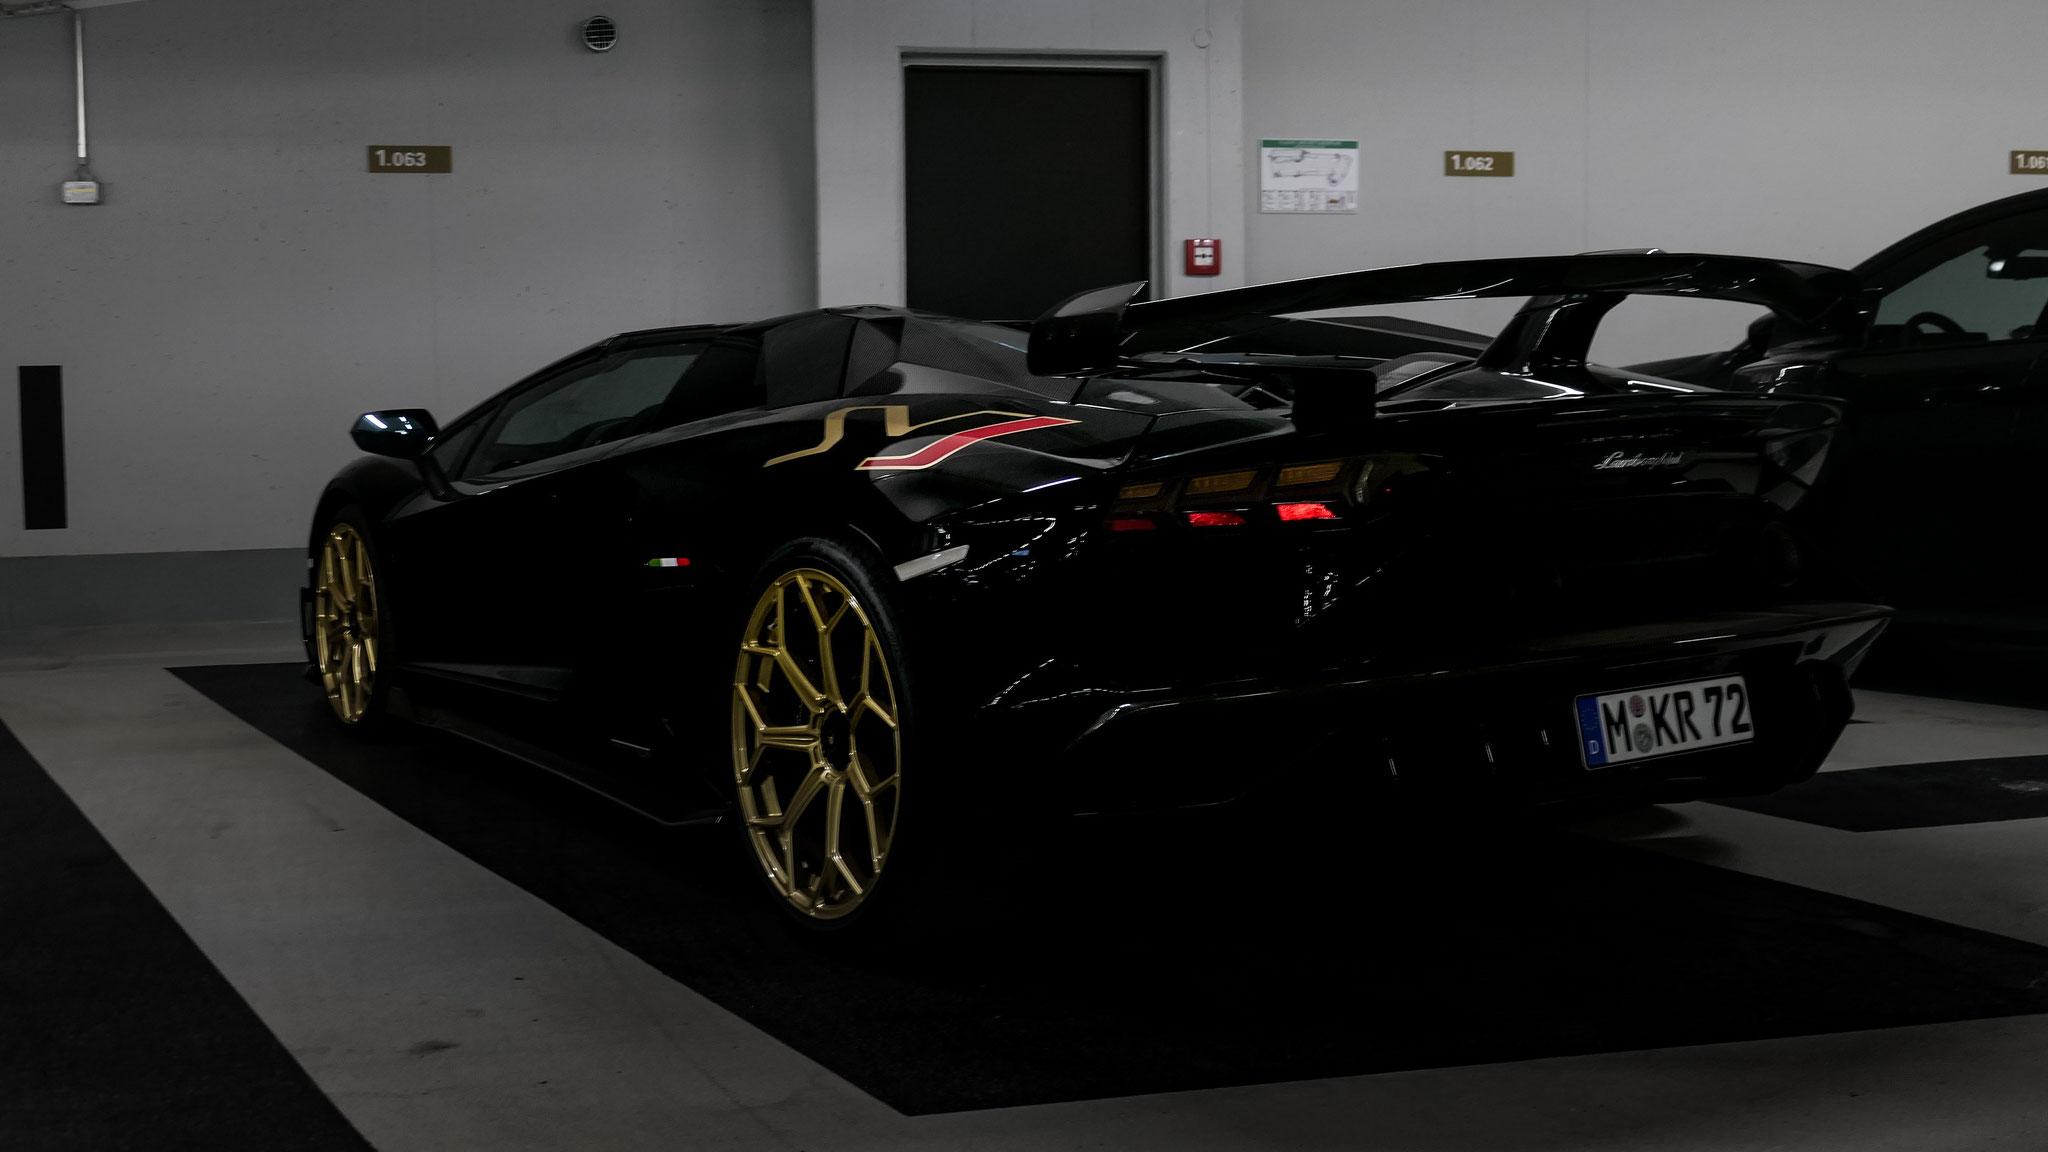 Lamborghini Aventador SVJ Roadster - M-KR-72